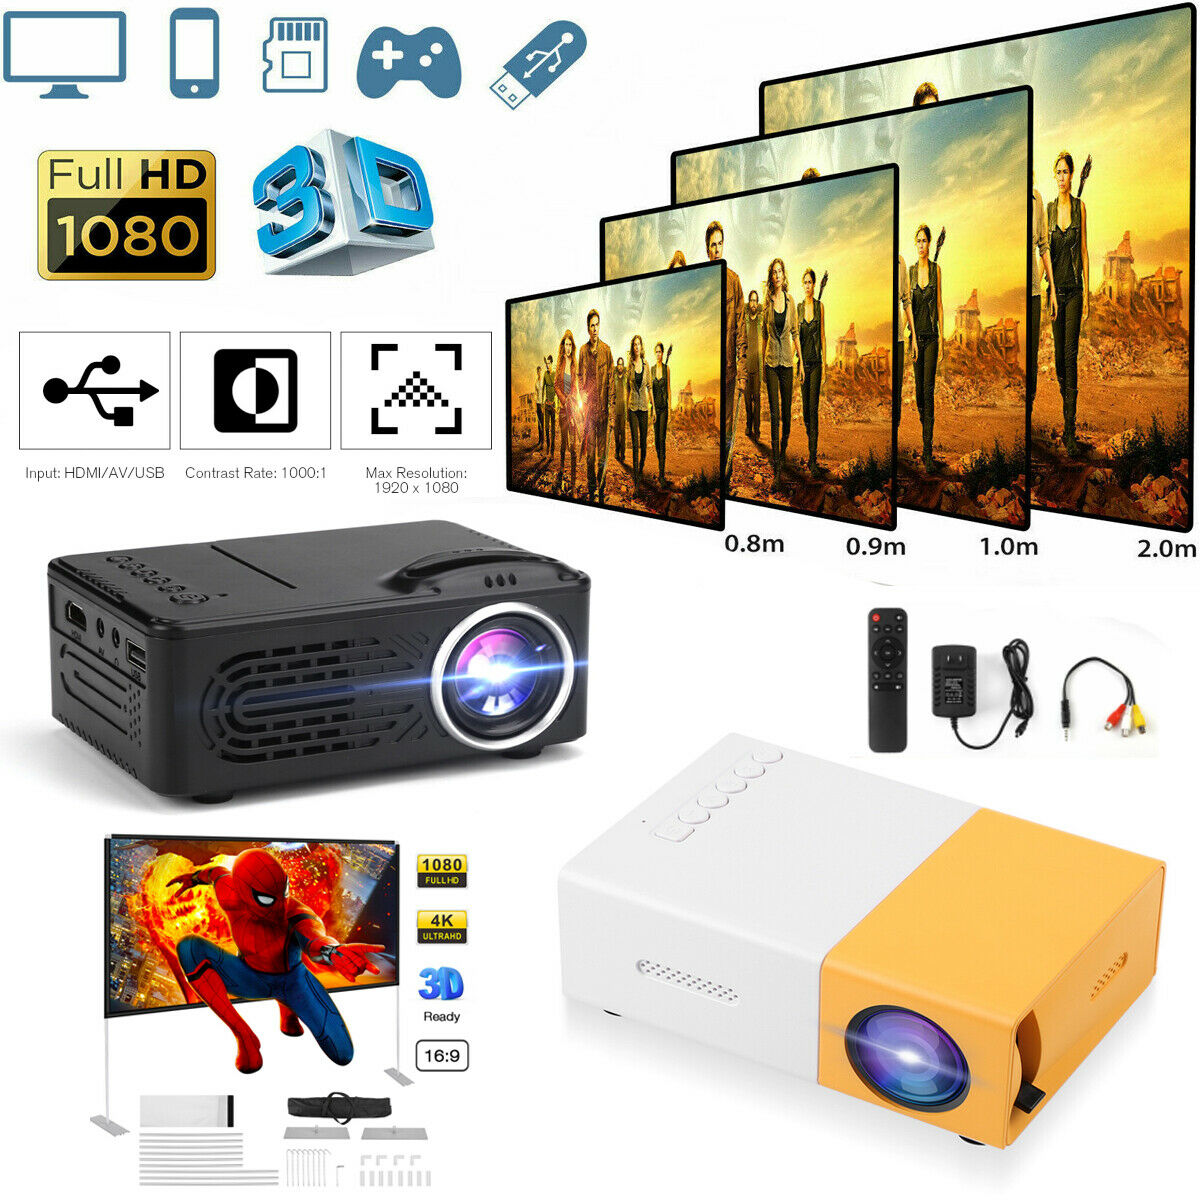 1080p Full HD Portable LED Mini Projector Home Theater Cinem